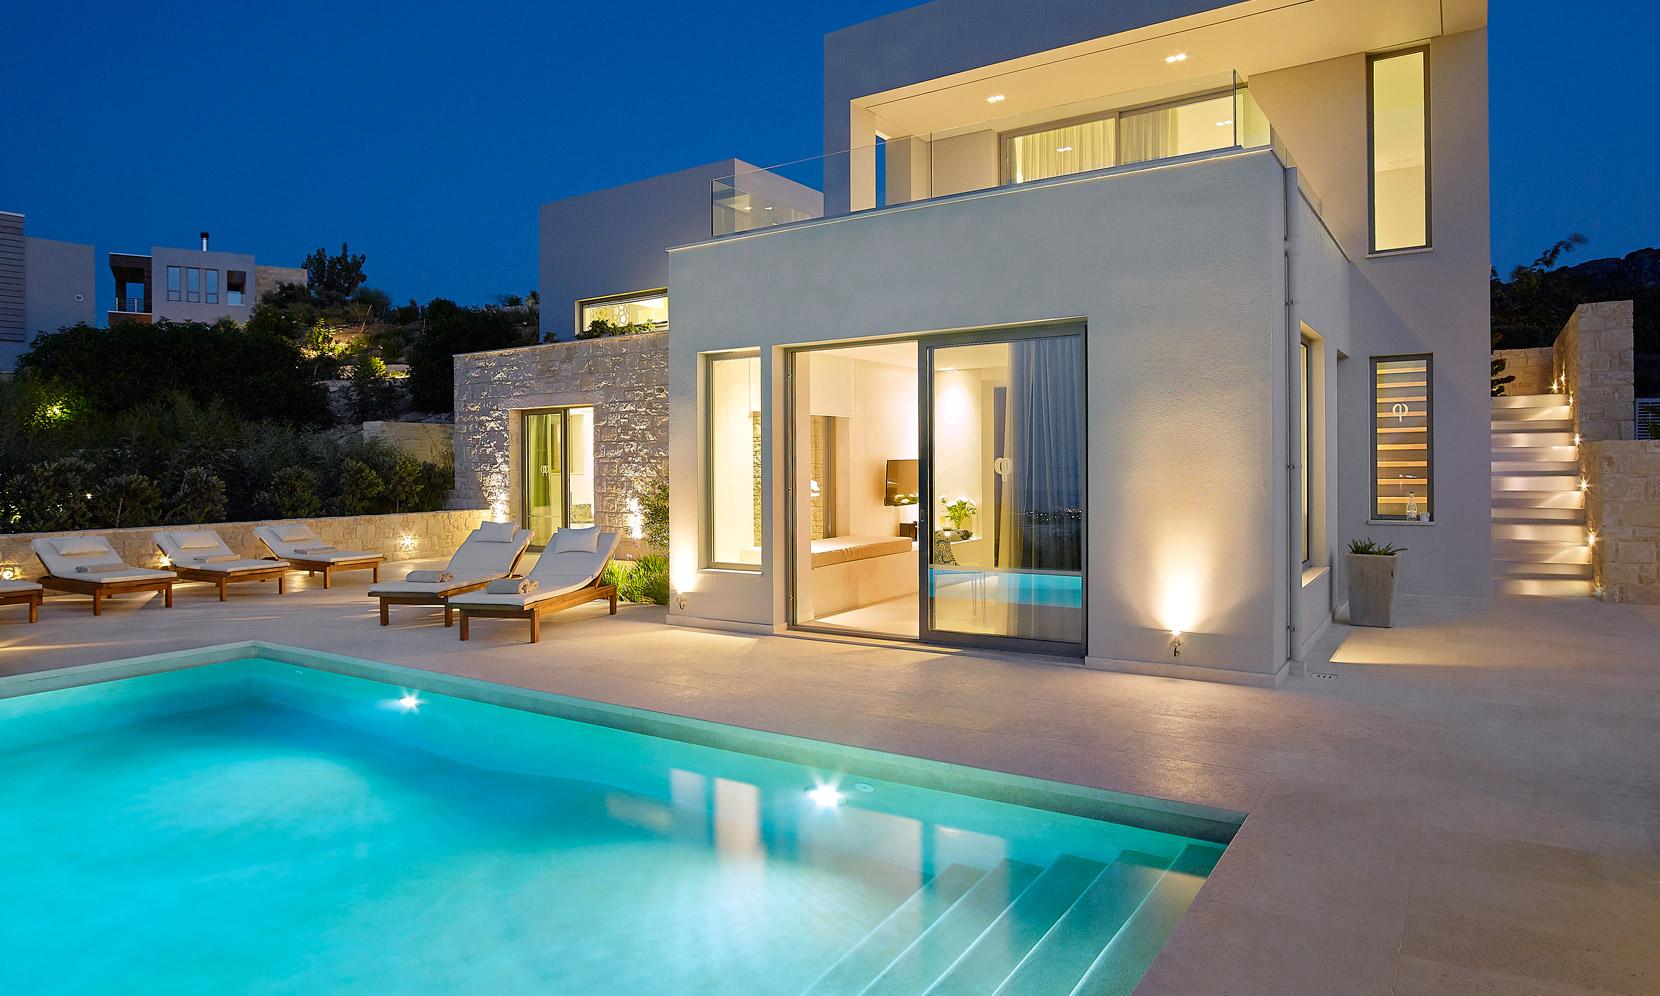 Crete Villa Clementine jumbotron image